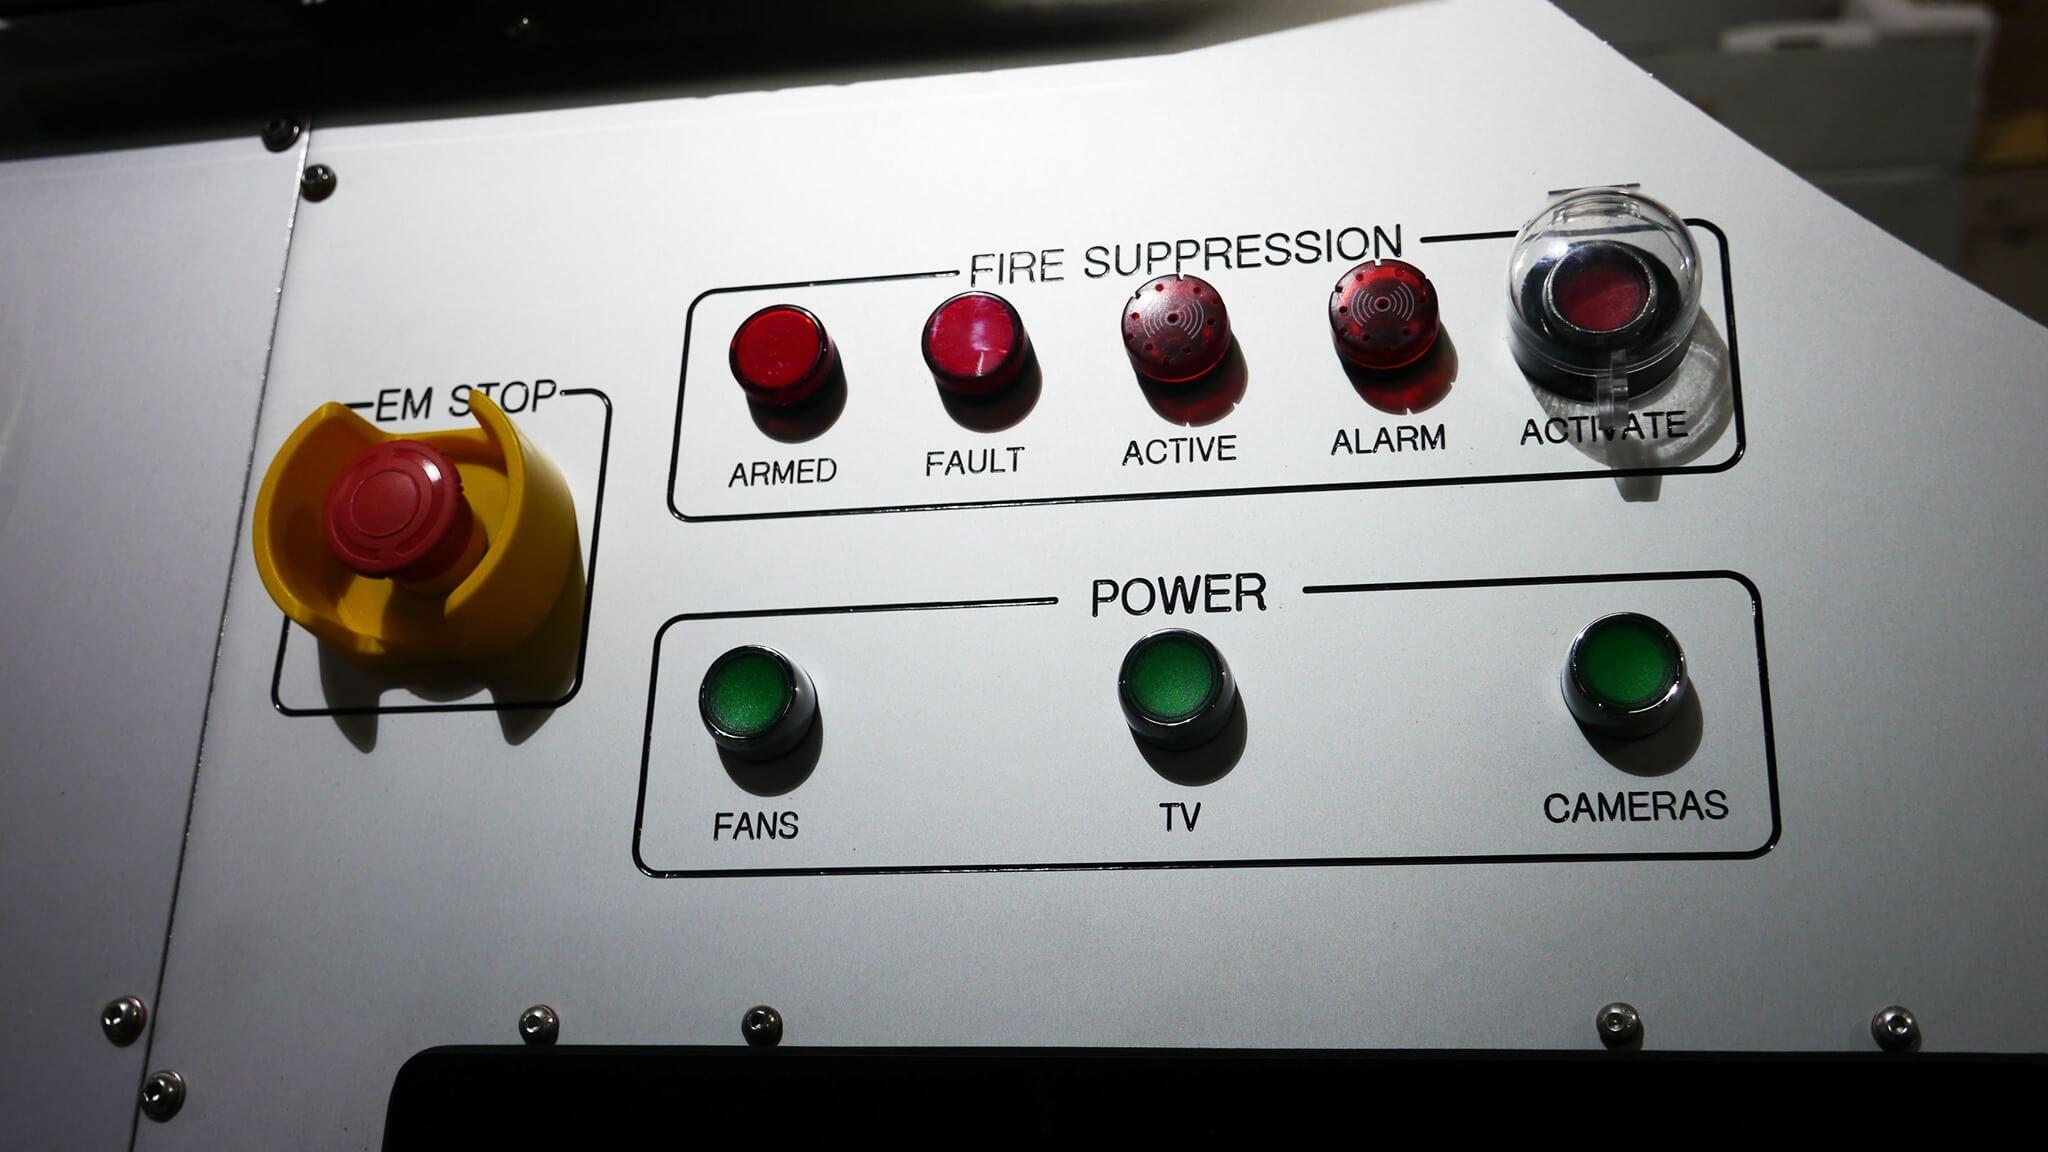 V6 automatic chamber panel fire suppression controls